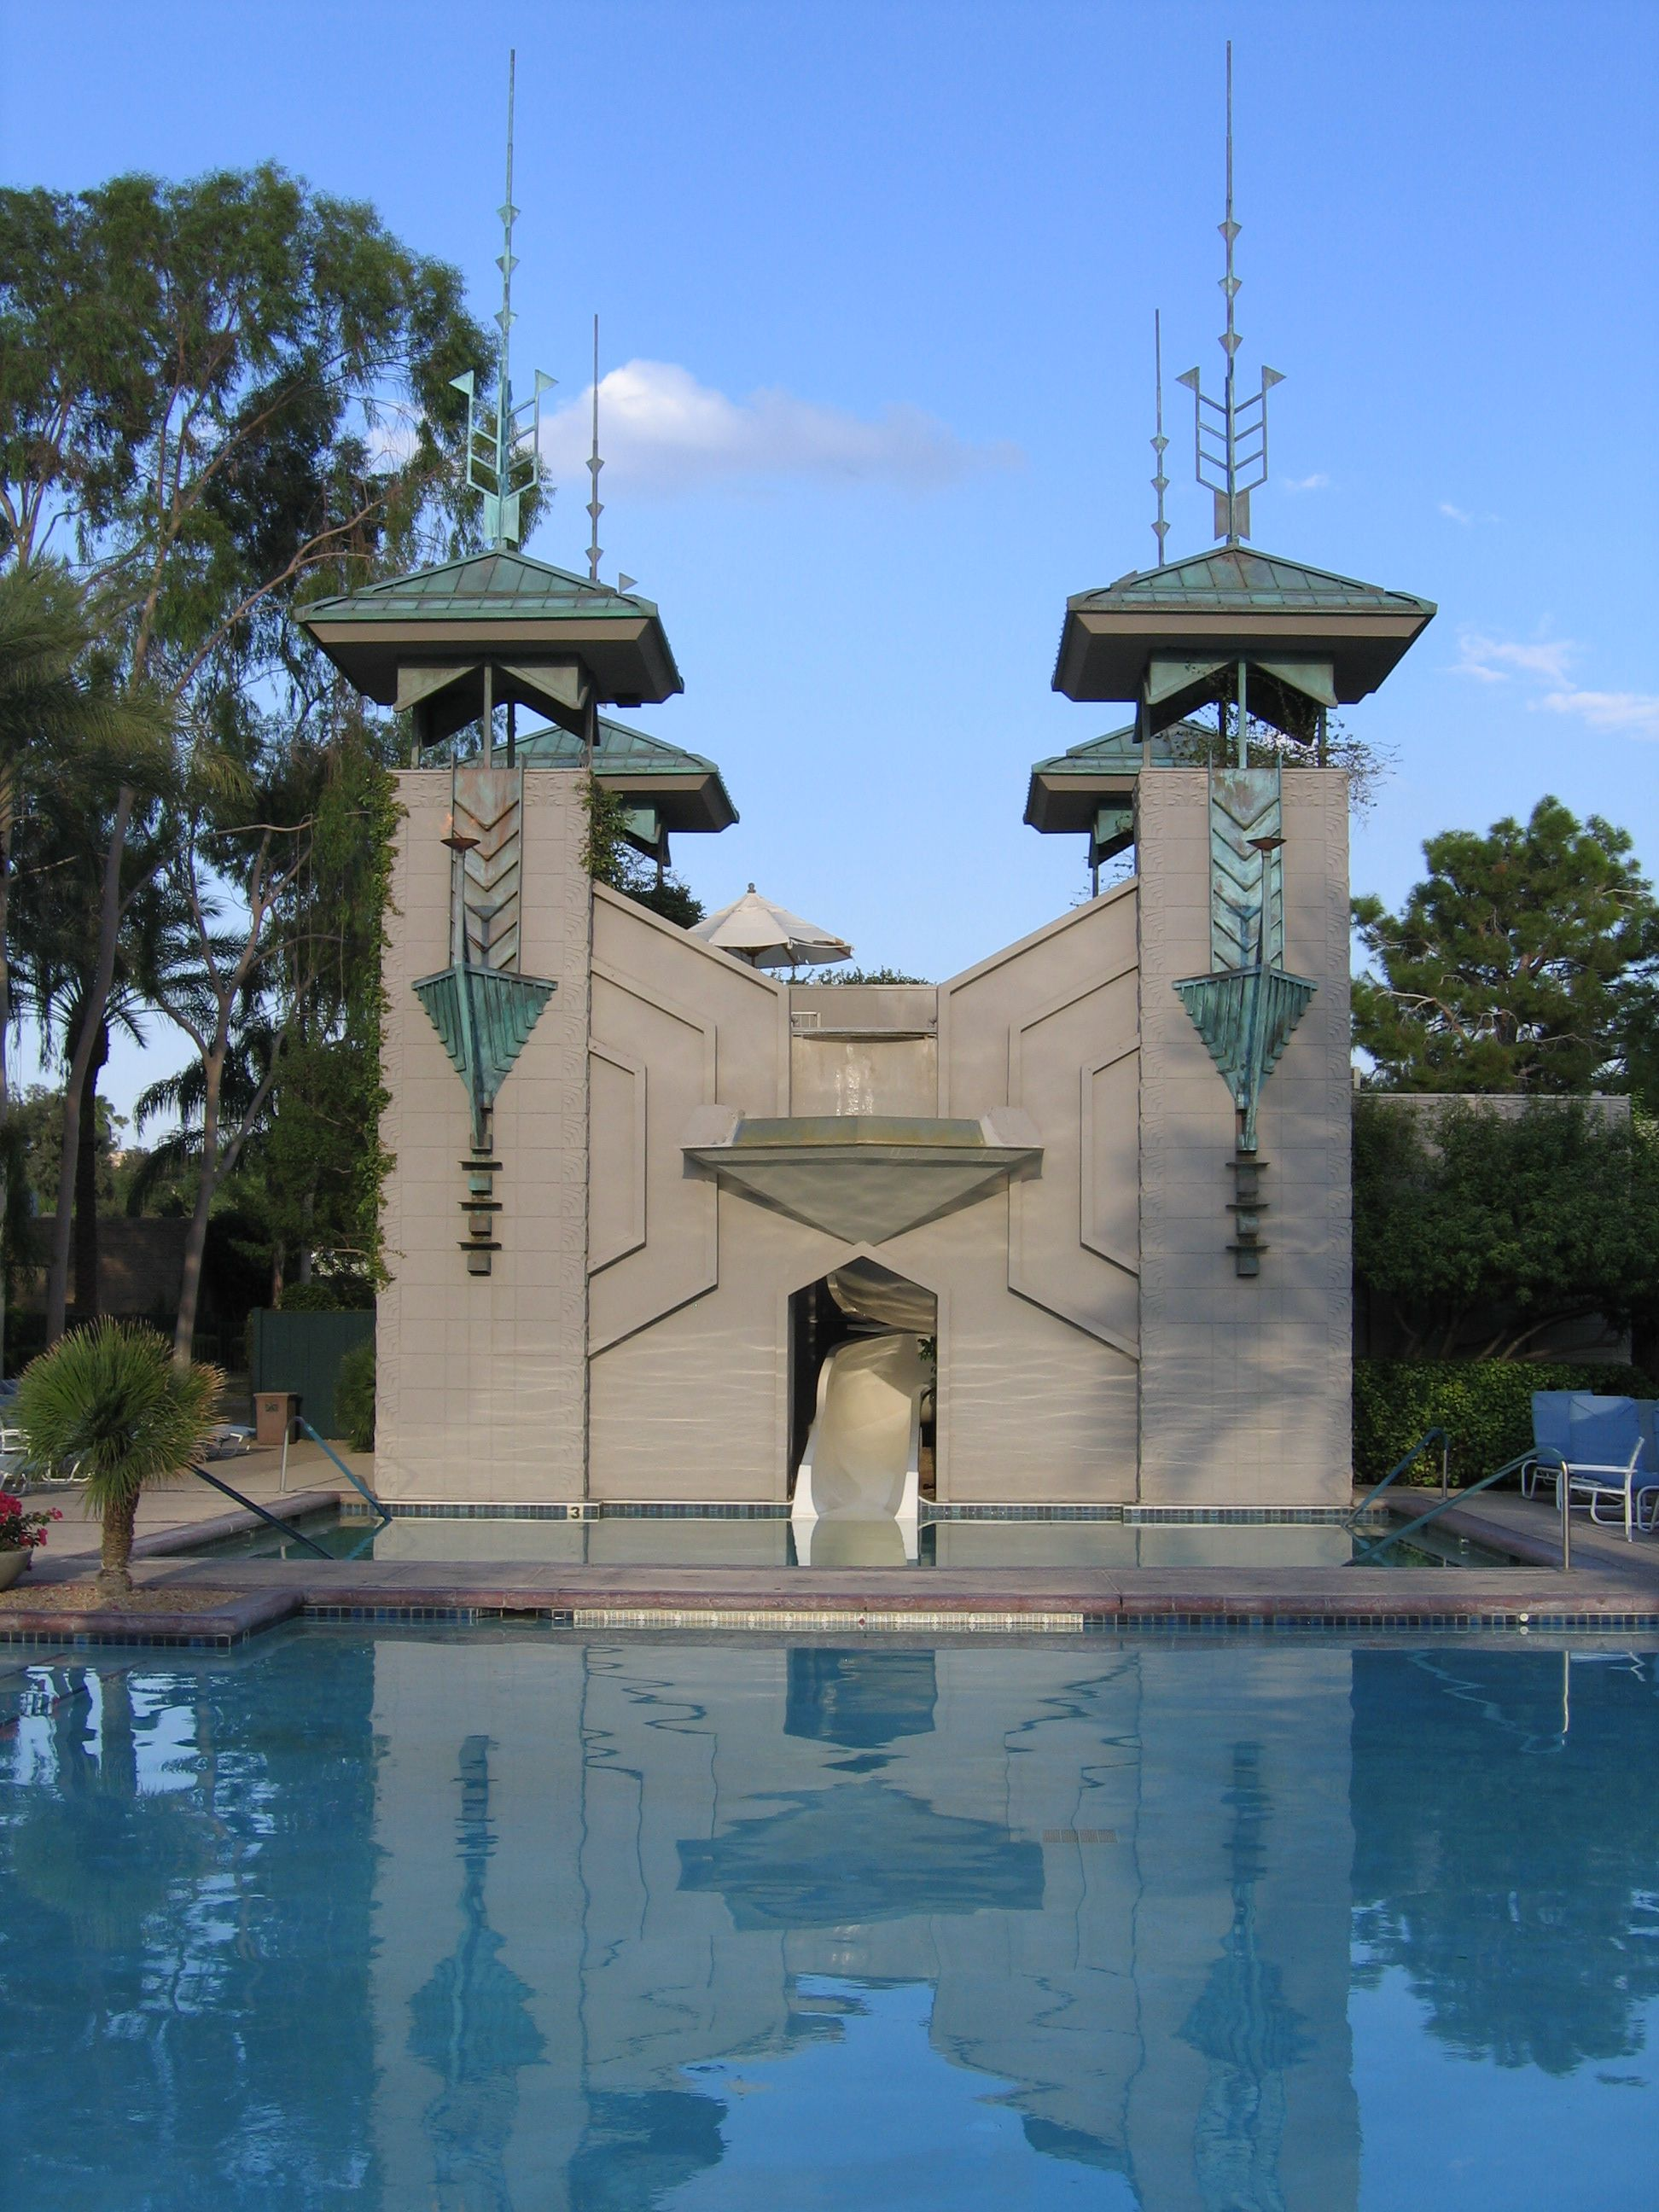 Pool At The Arizona Biltmore Hotelphoenix 1929 Frank Schematic Lloyd Wright Design Architect Albert Chase Mcarthur Project